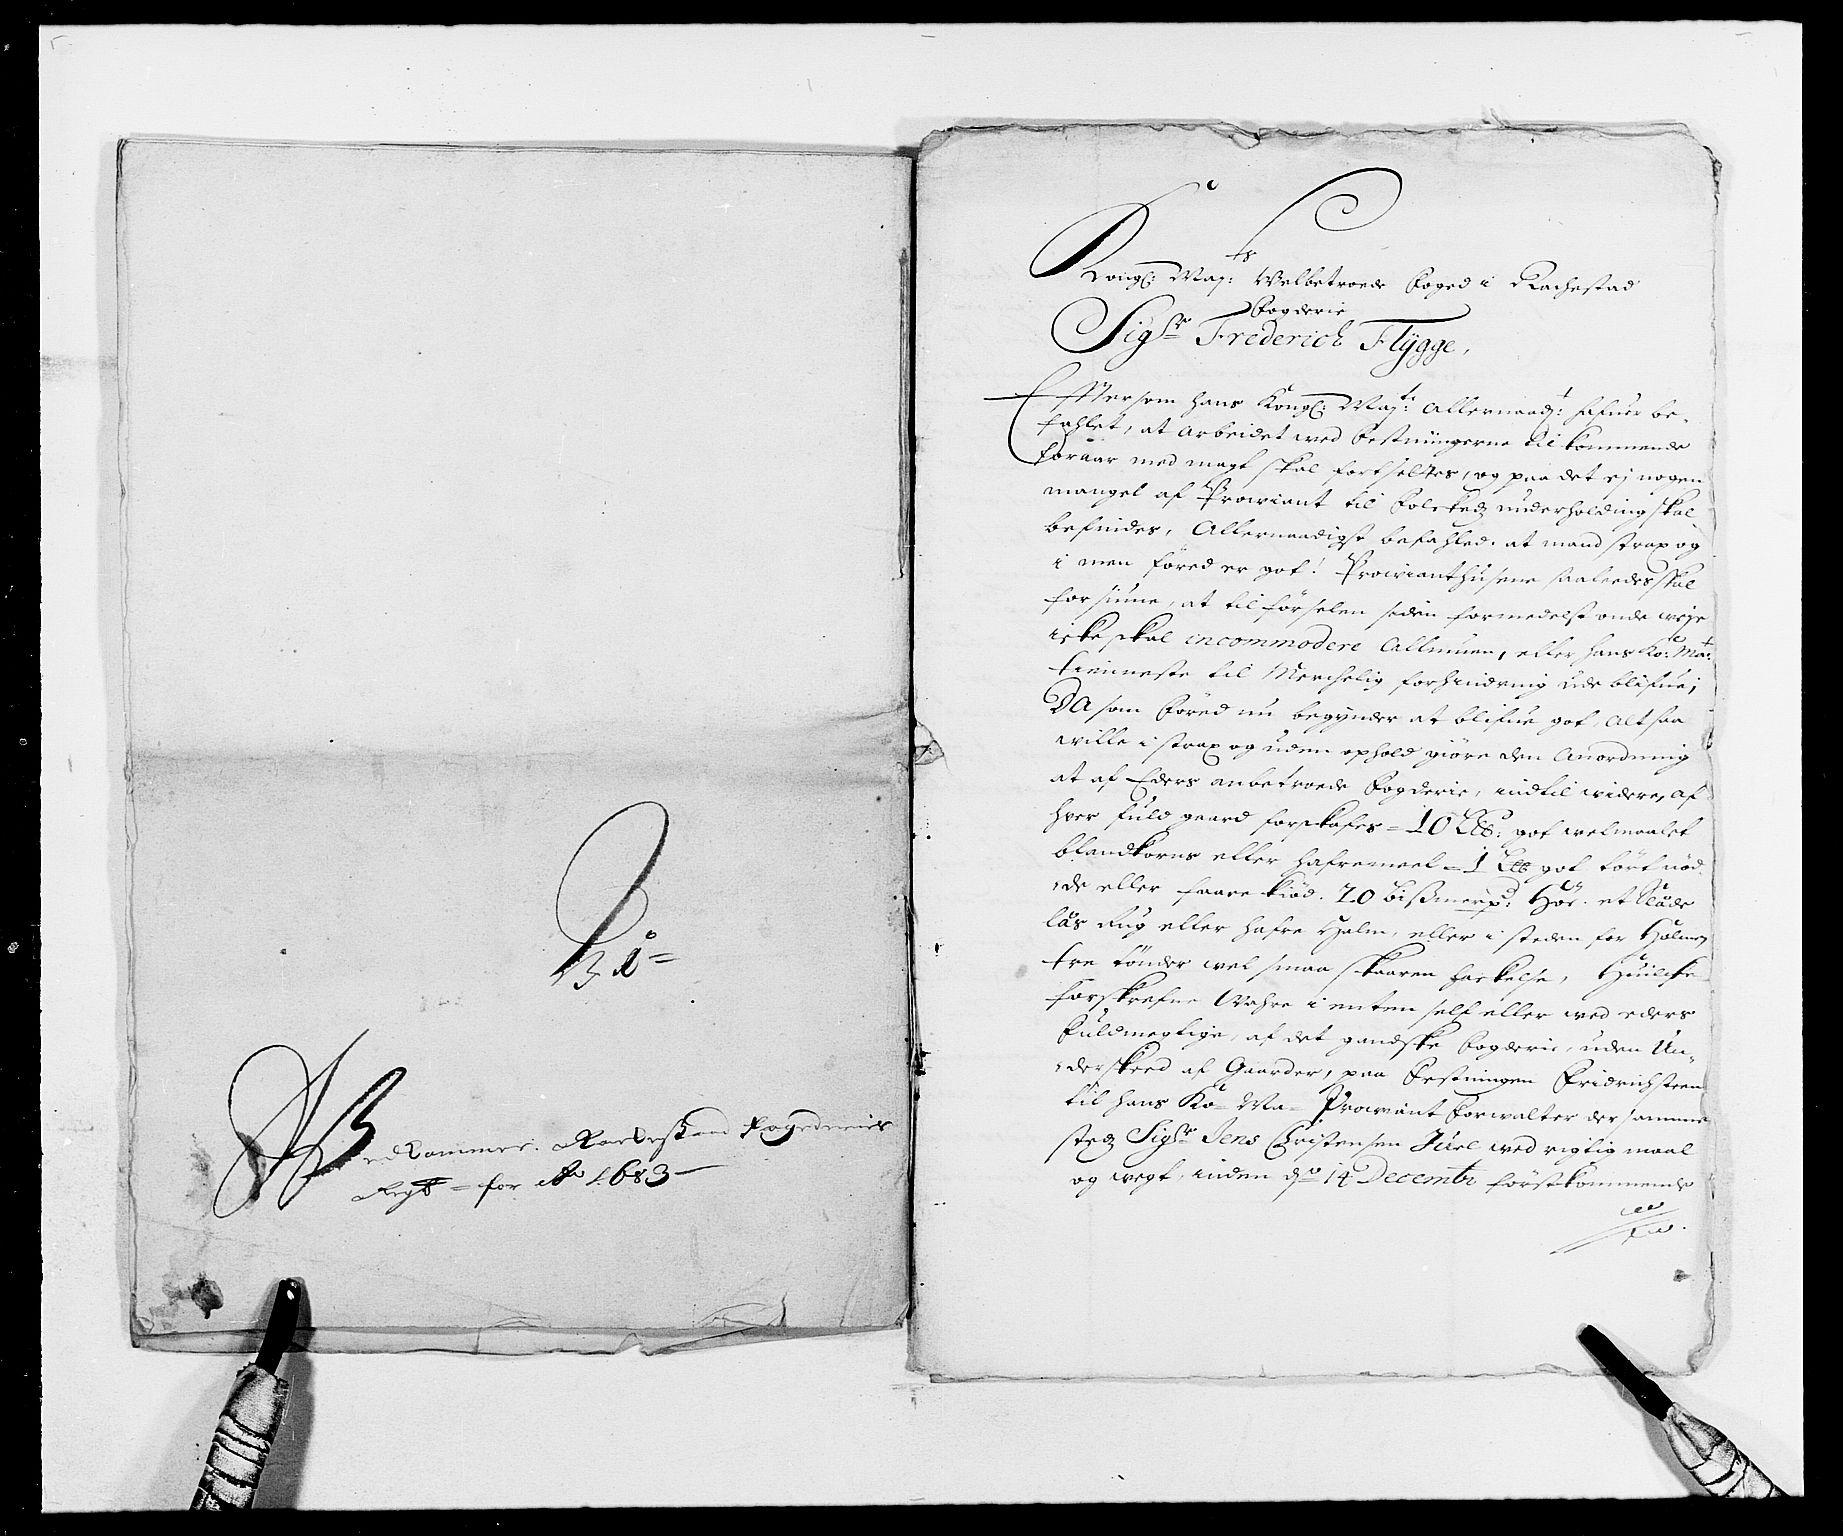 RA, Rentekammeret inntil 1814, Reviderte regnskaper, Fogderegnskap, R05/L0274: Fogderegnskap Rakkestad, 1683-1684, s. 222